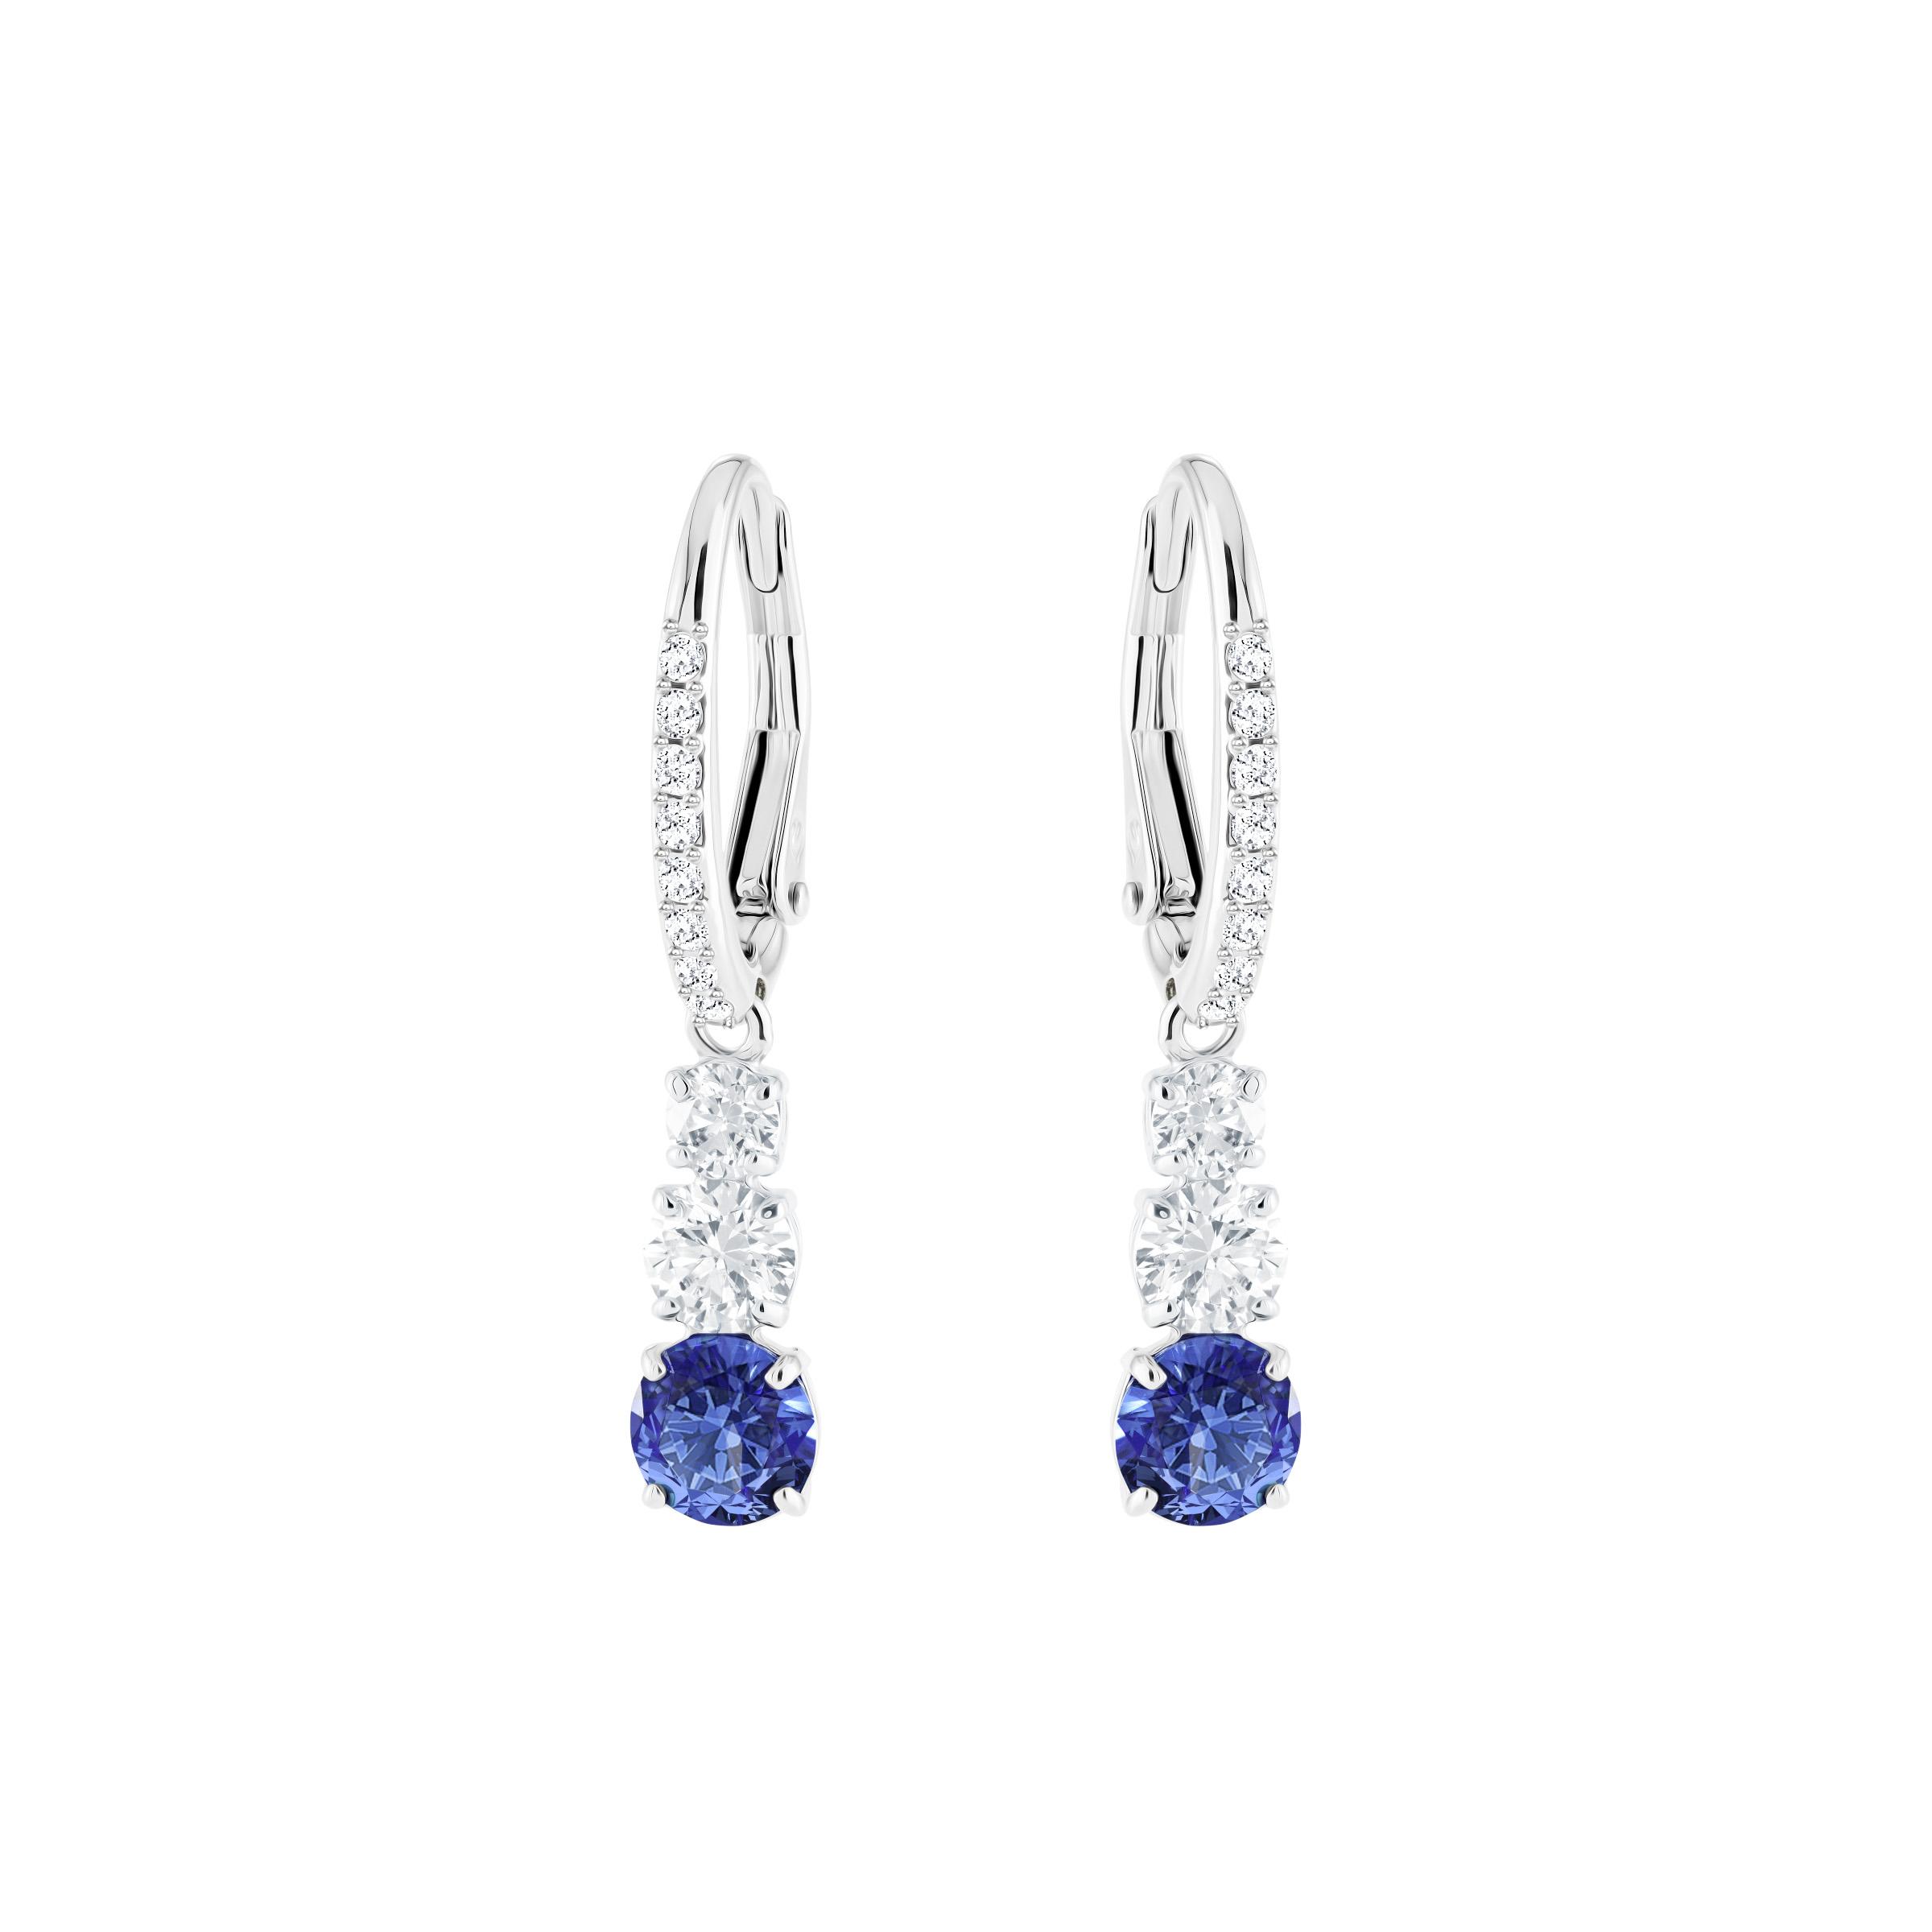 Boucles d'oreilles Attract Trilogy Round, bleu, Métal rhodié, Swarovski